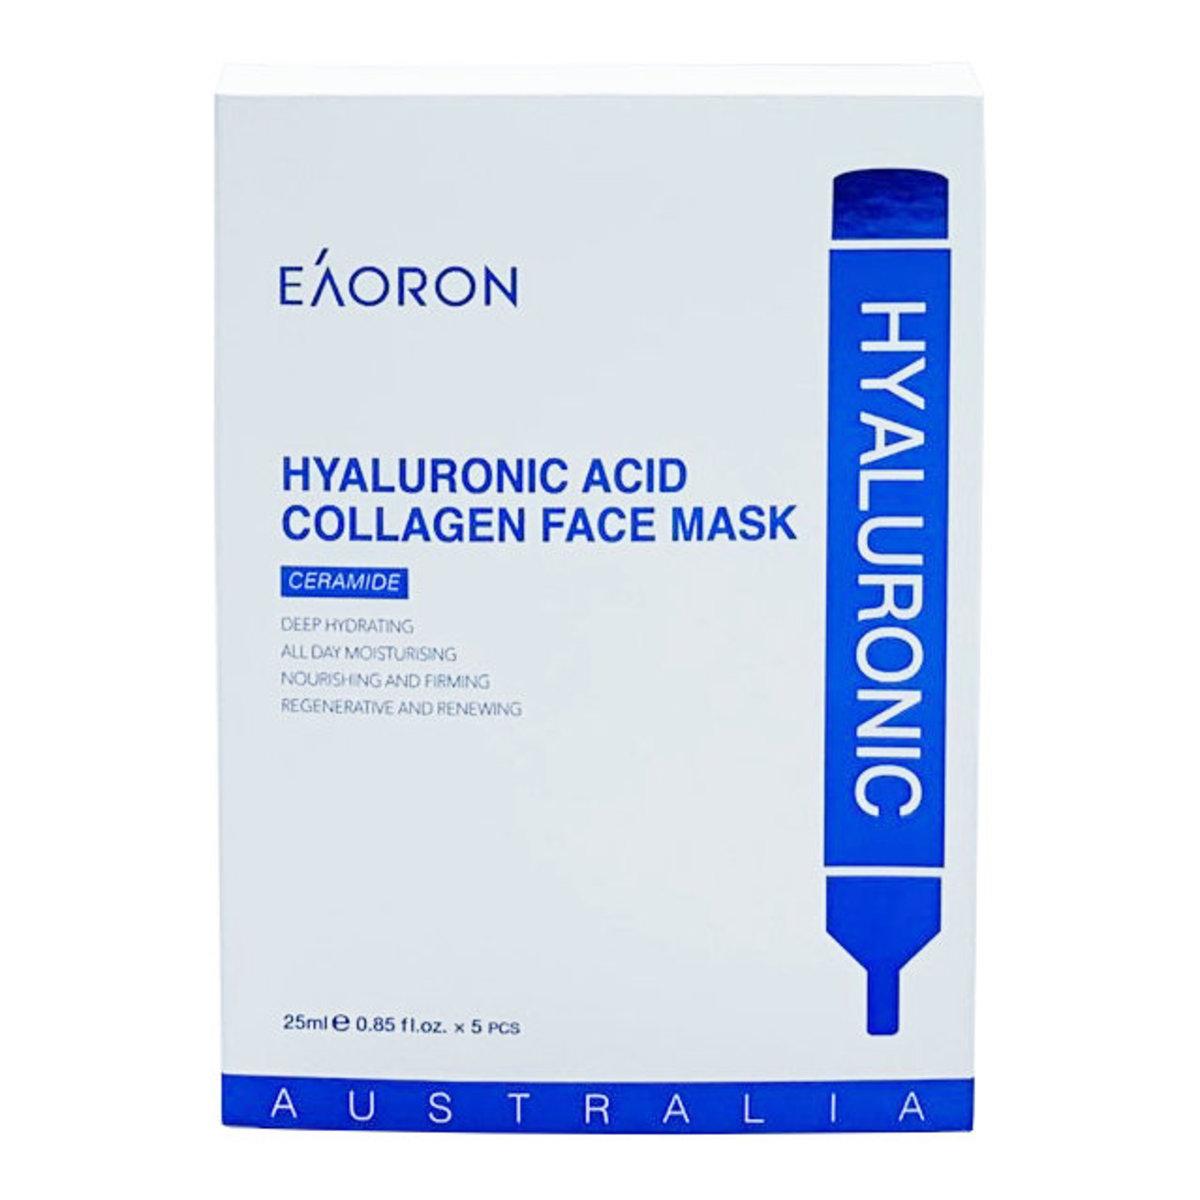 Hyaluronic Acid Collagen Face Mask 5pcs [Parallel Import] (9348107000488)